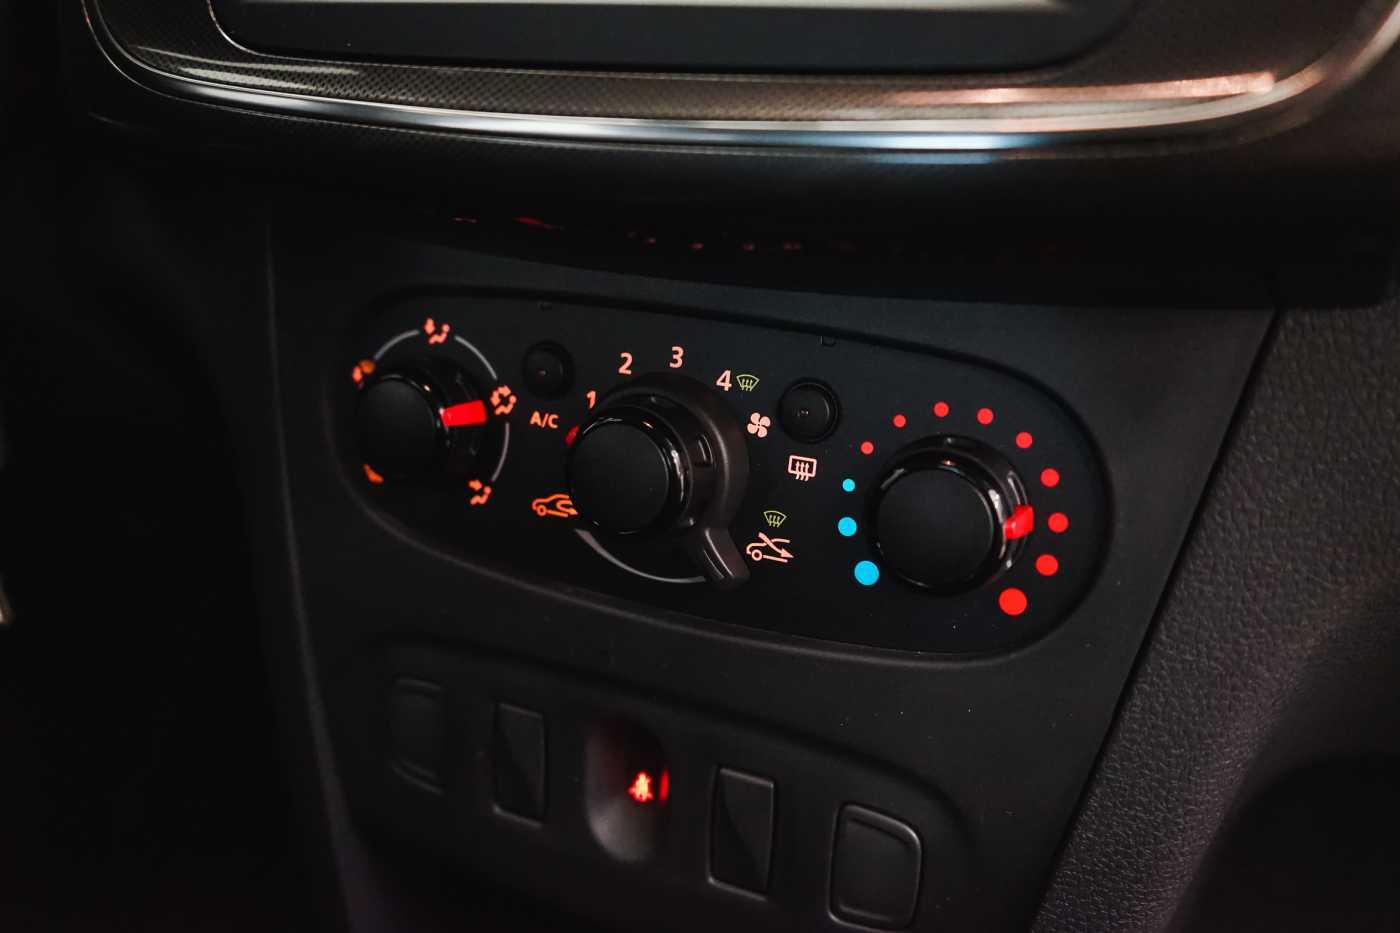 Dacia Sandero 1.0i SCe Stepway // Navi, Bluetooth, Airco, USB 13/27